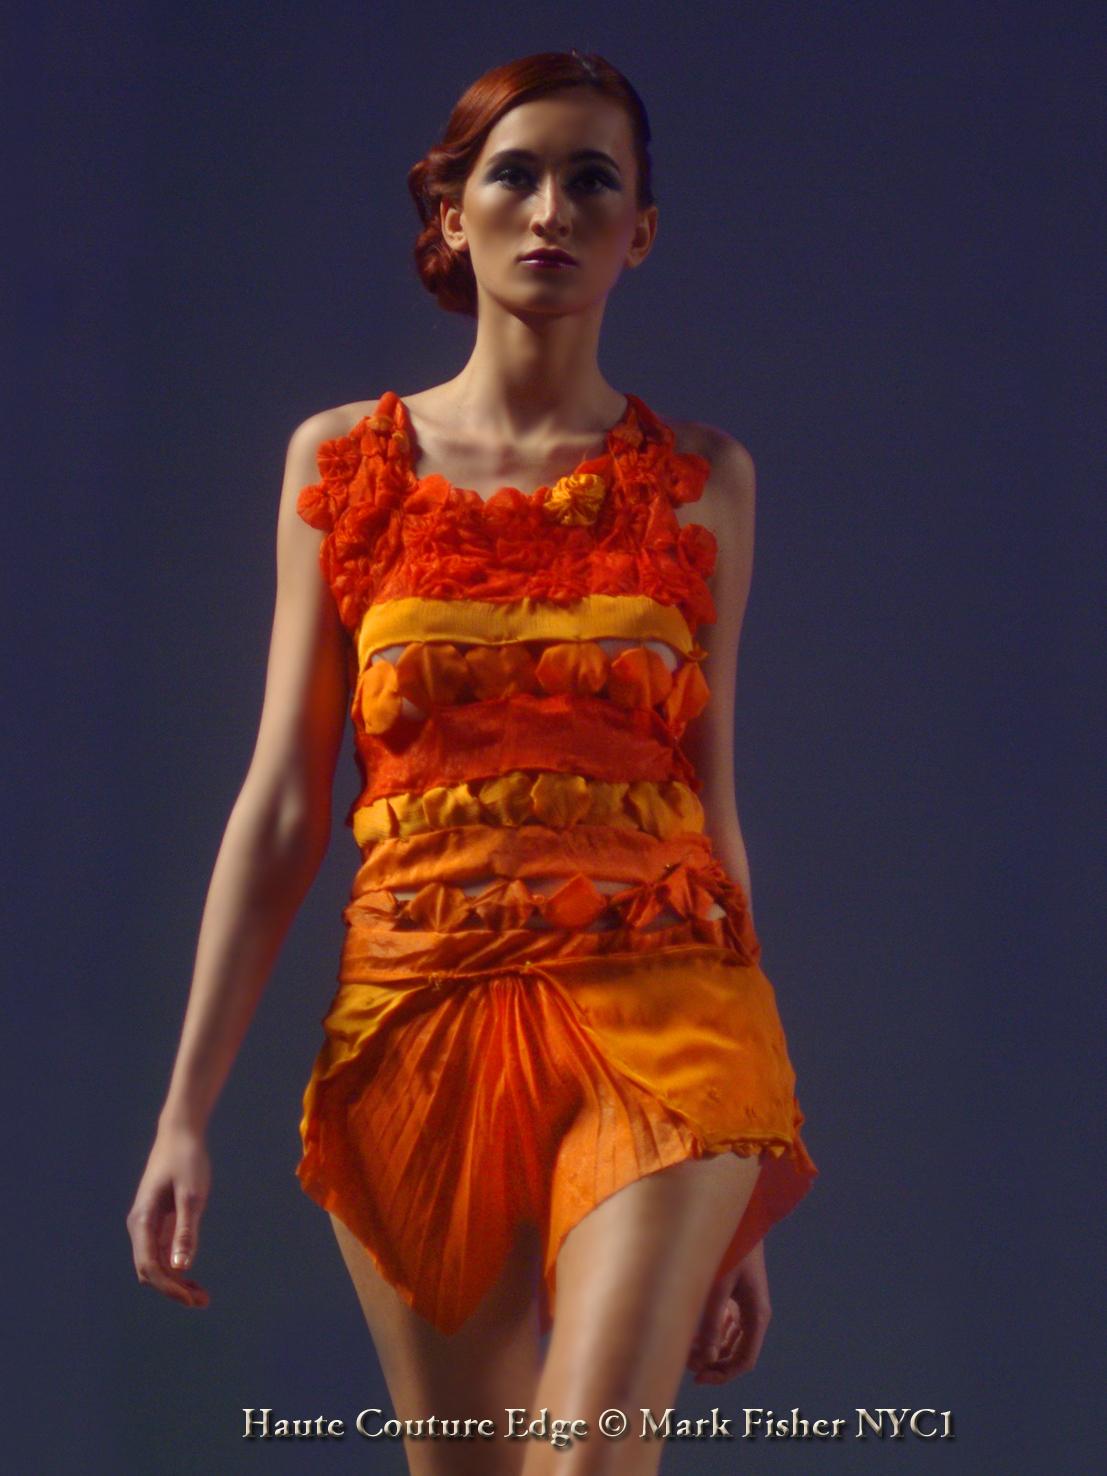 Mark fisher american photographer haute couture edge for American haute couture